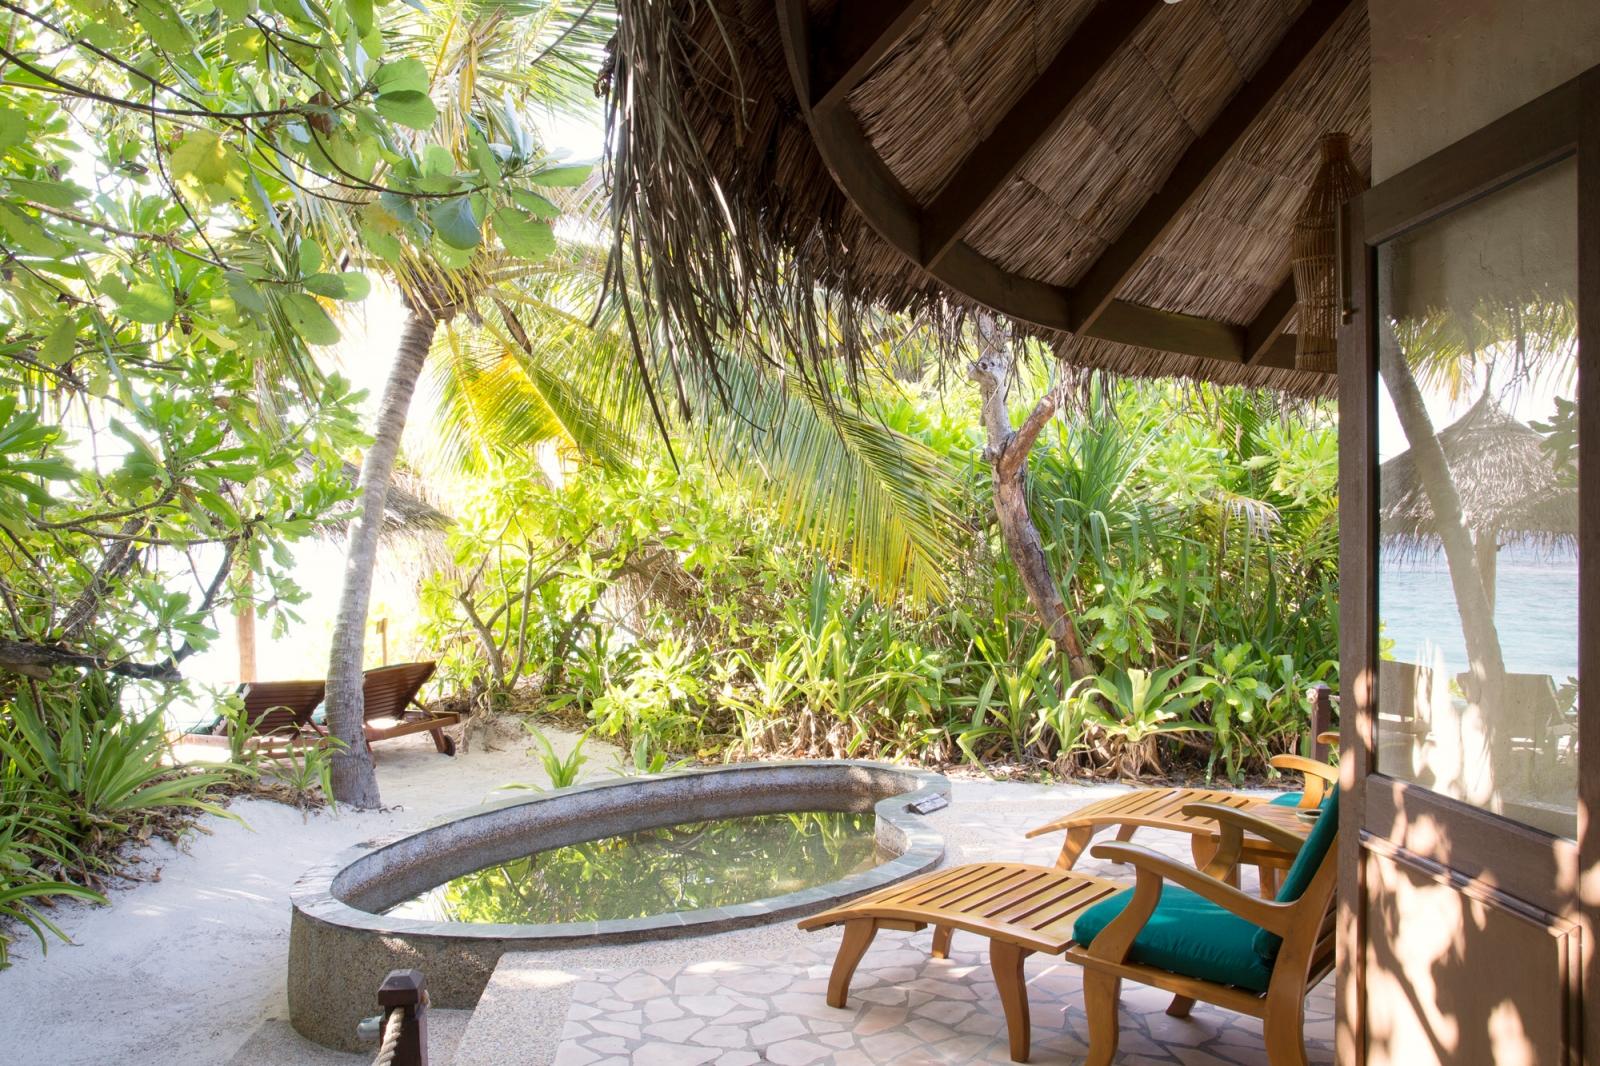 Maldives Deluxe Villas Dhuni Kolhu Coco Collection